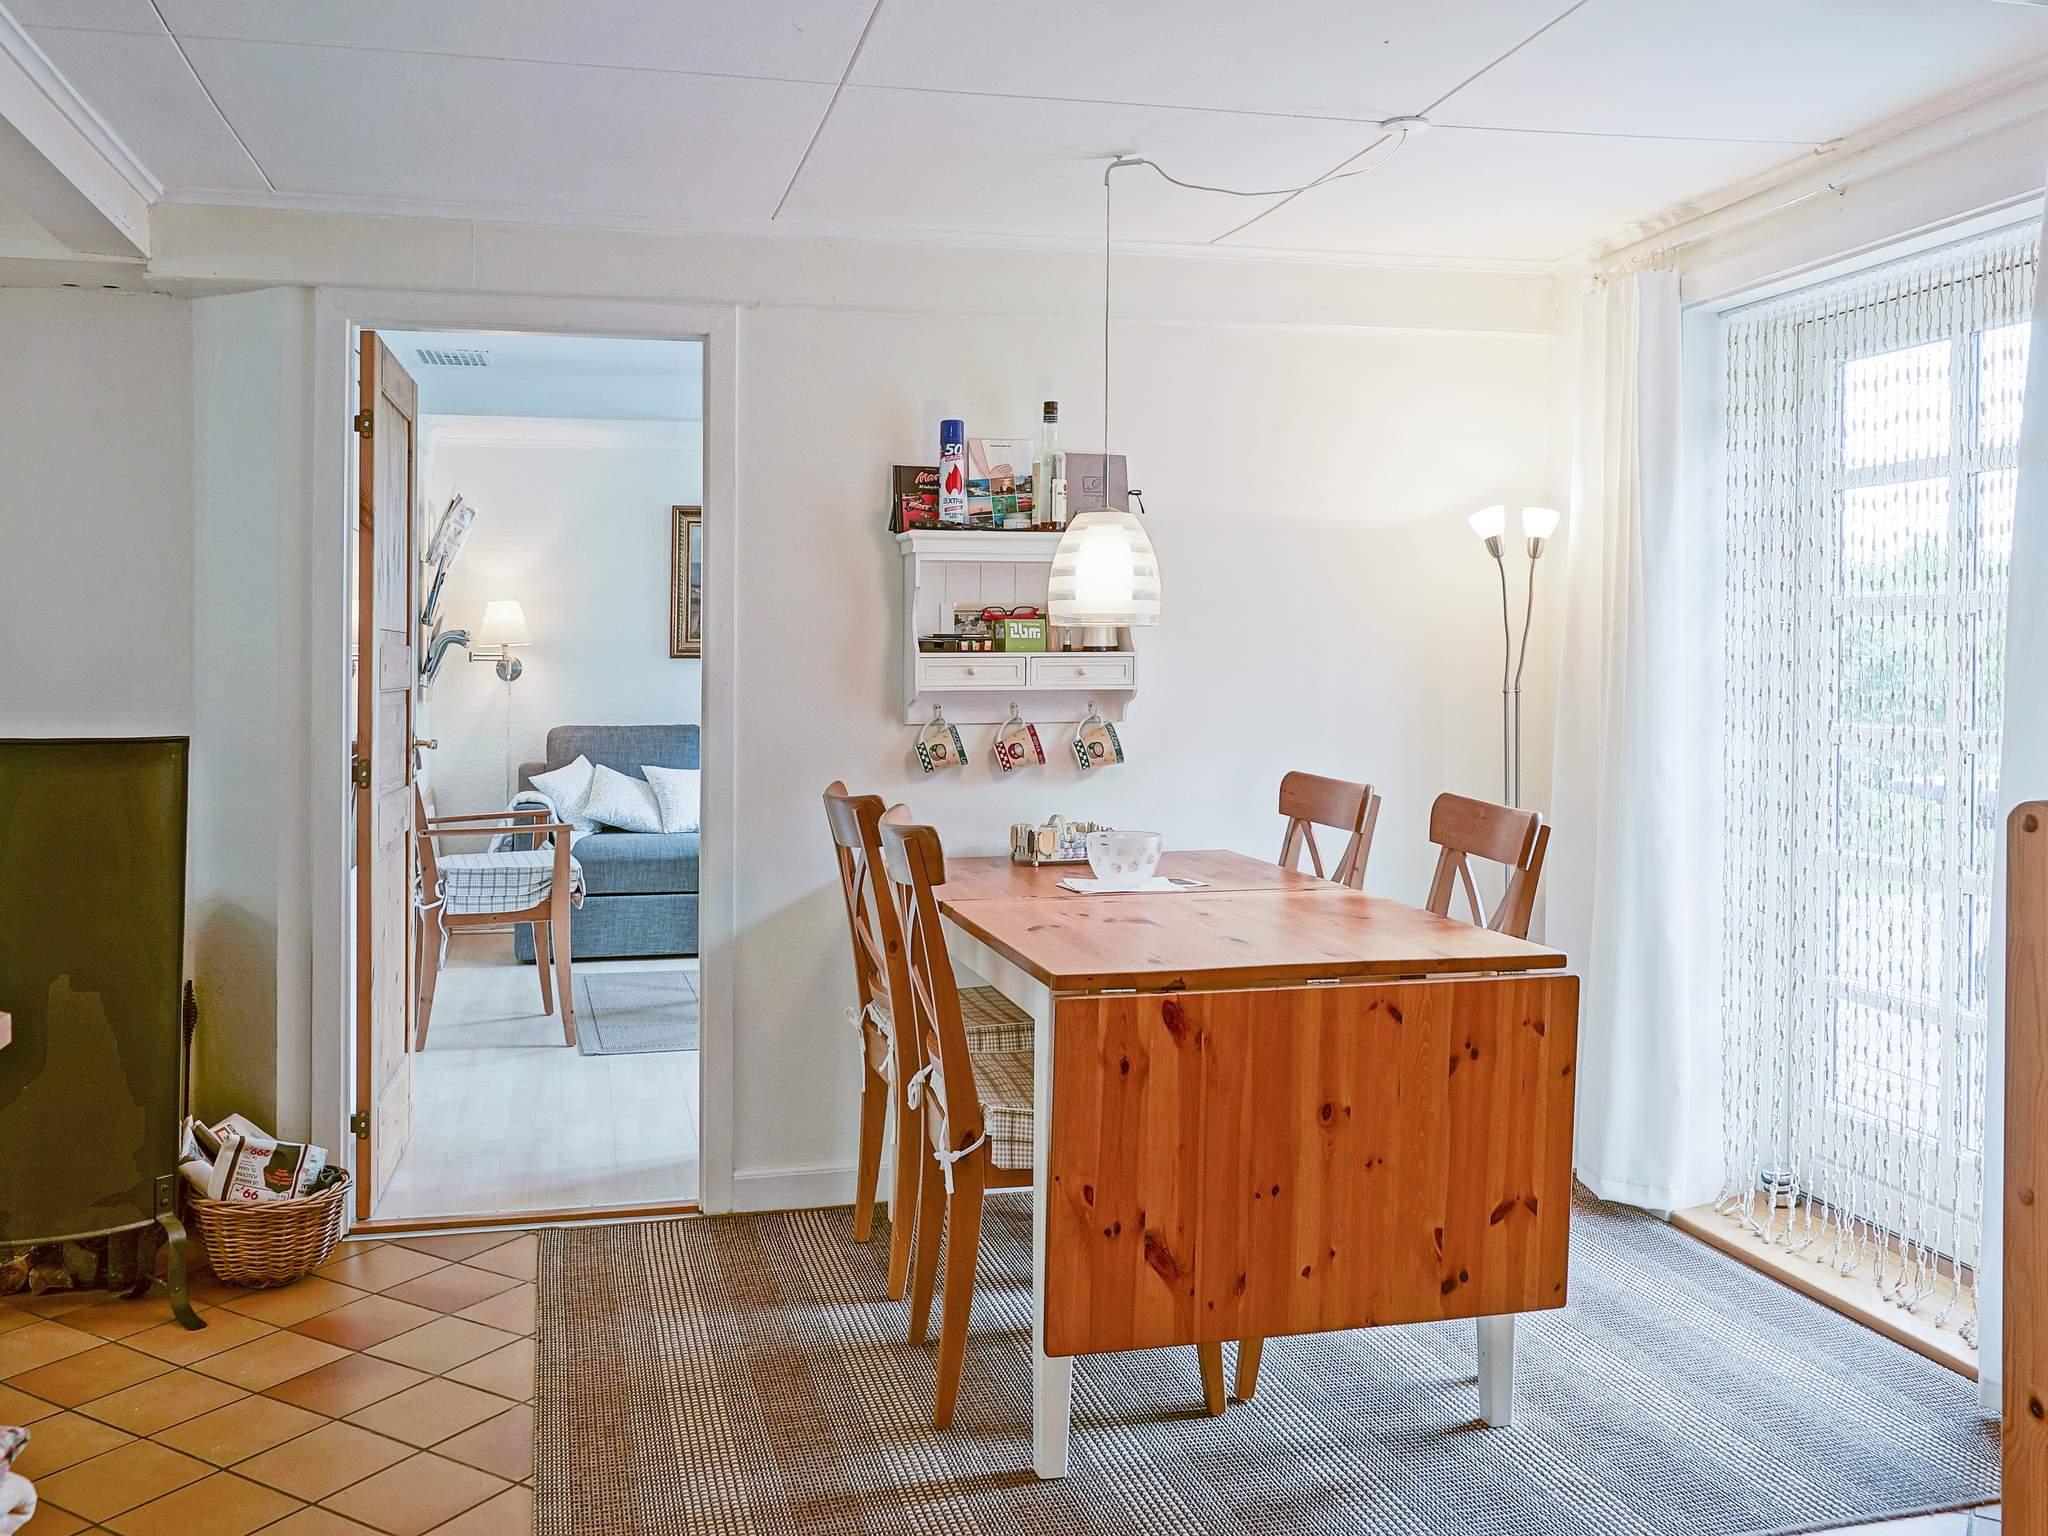 Ferienhaus Svaneke (86798), Svaneke, , Bornholm, Dänemark, Bild 2